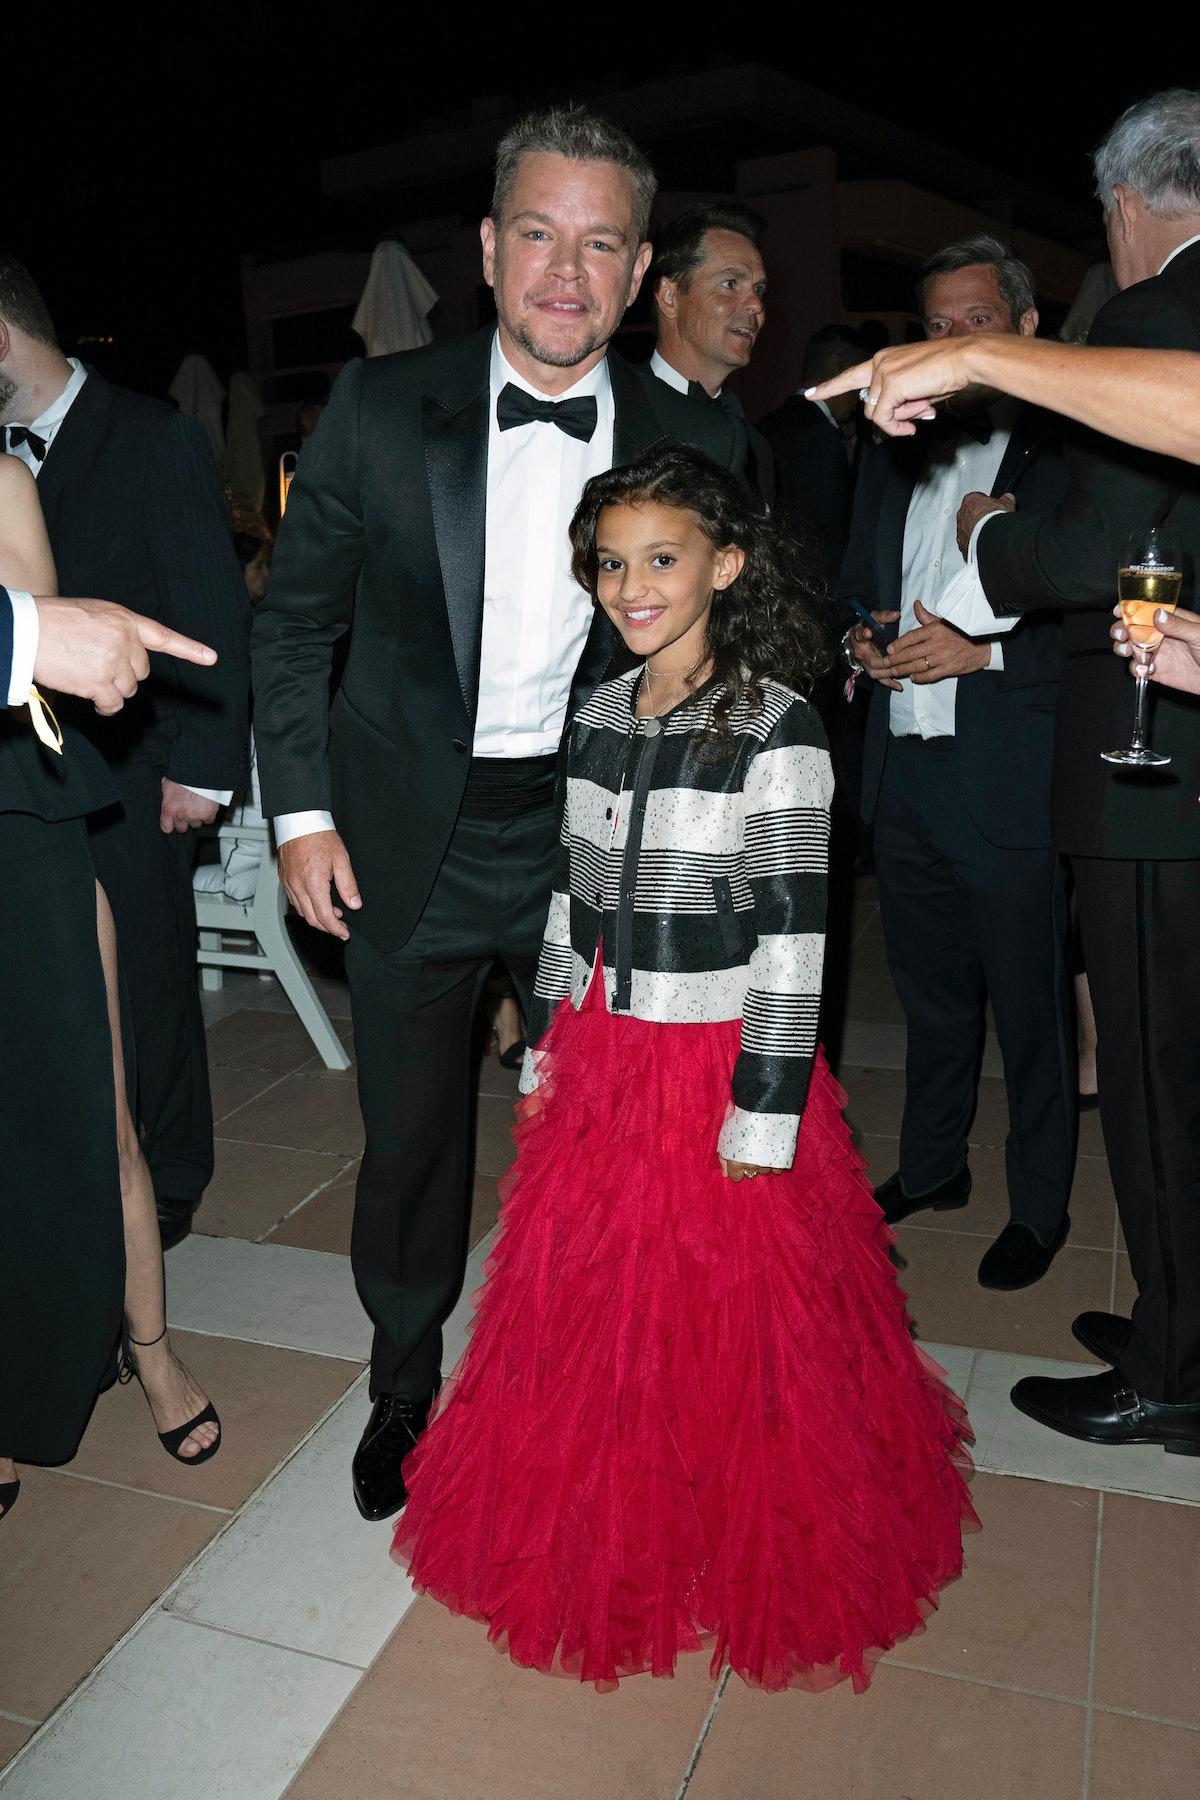 Matt Damon and Lilou Siauvaud